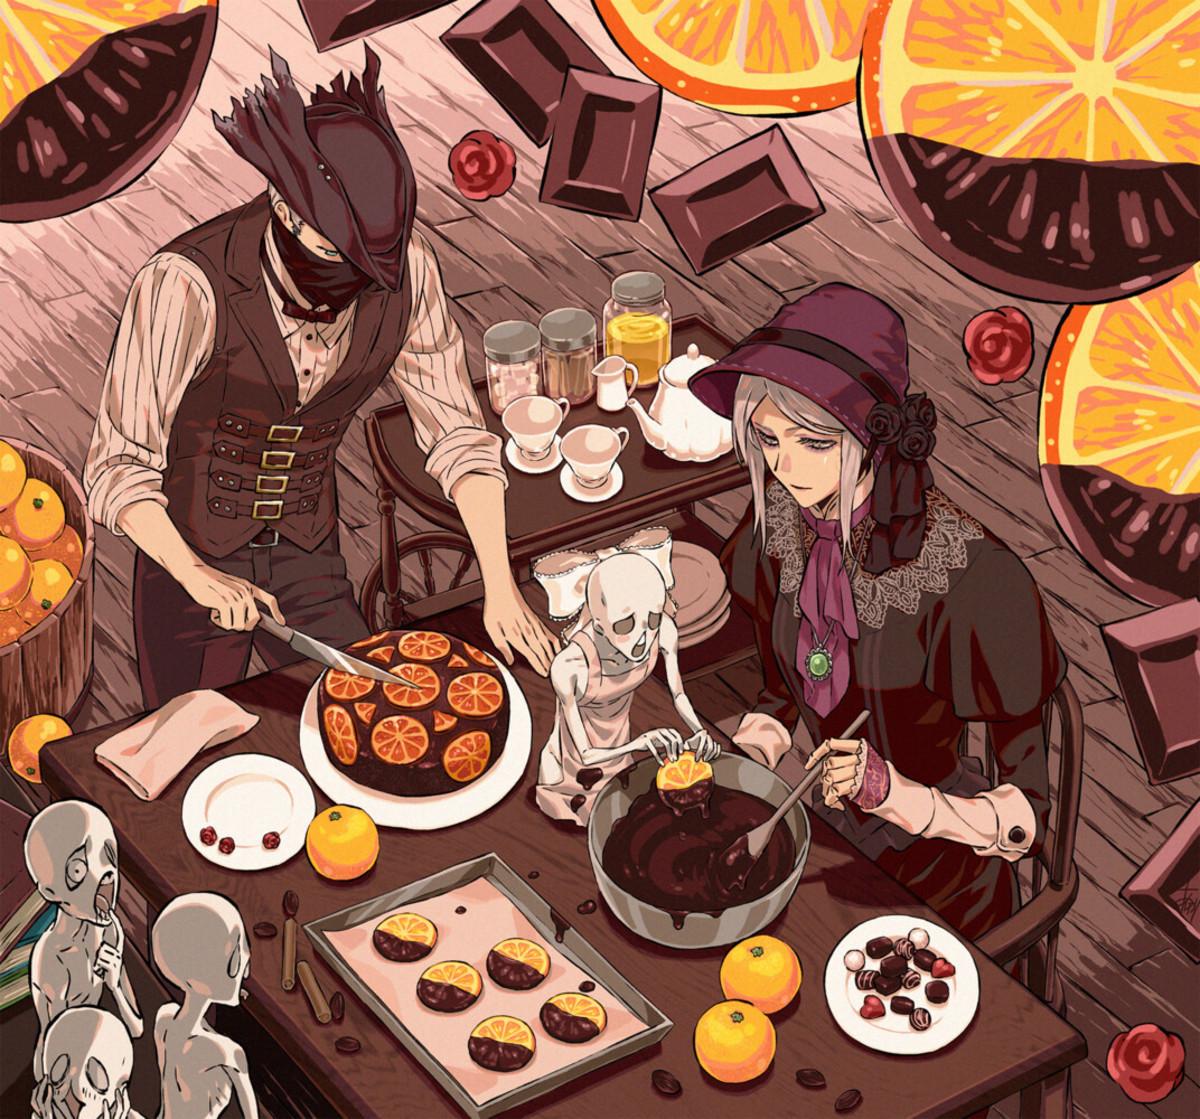 bloodborne pastries. Art by arizuka catacombe.. ...now i'm hungry.